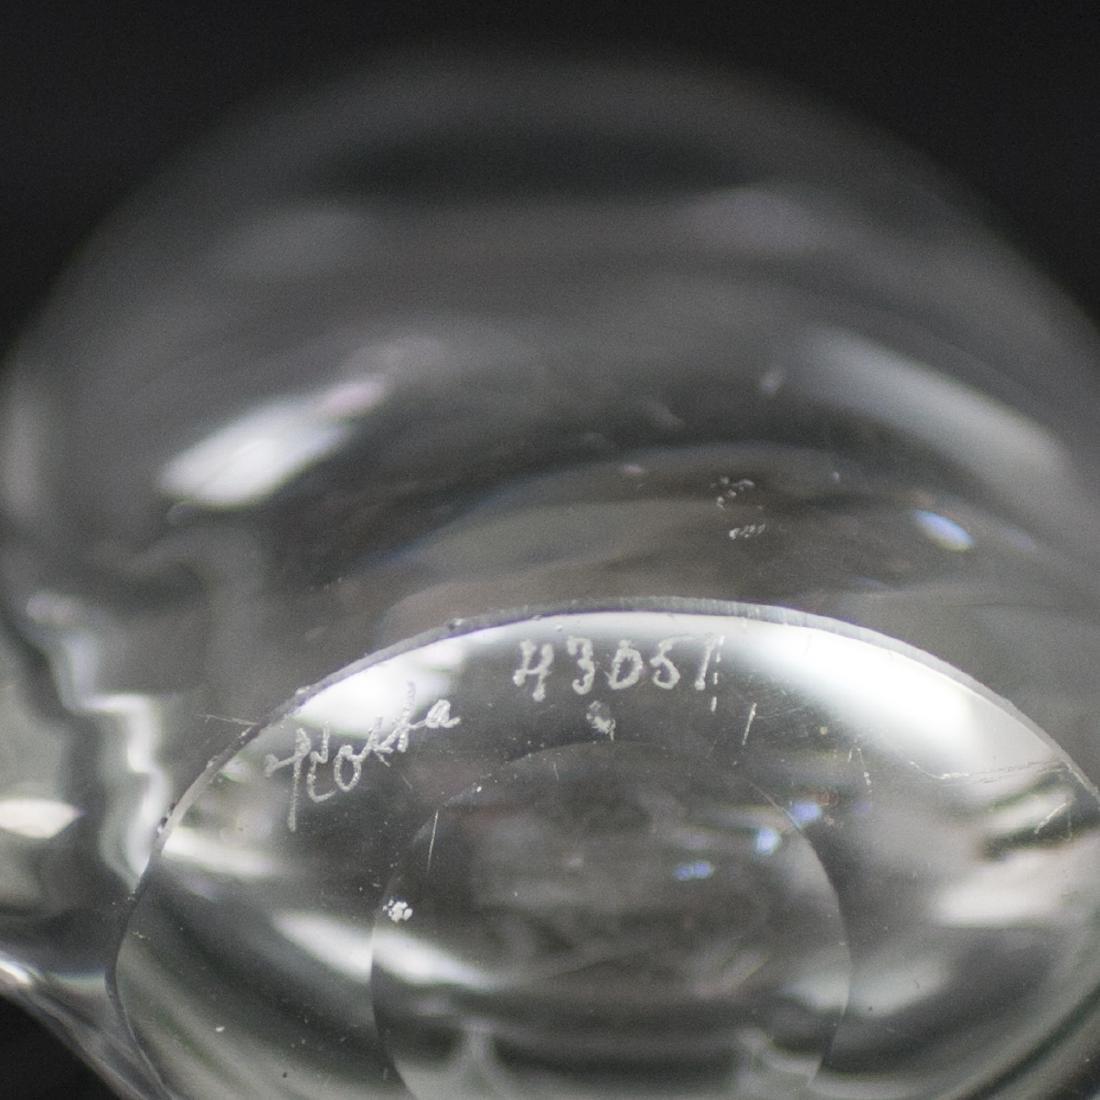 Kosta Boda Etched Crystal Vase - 3